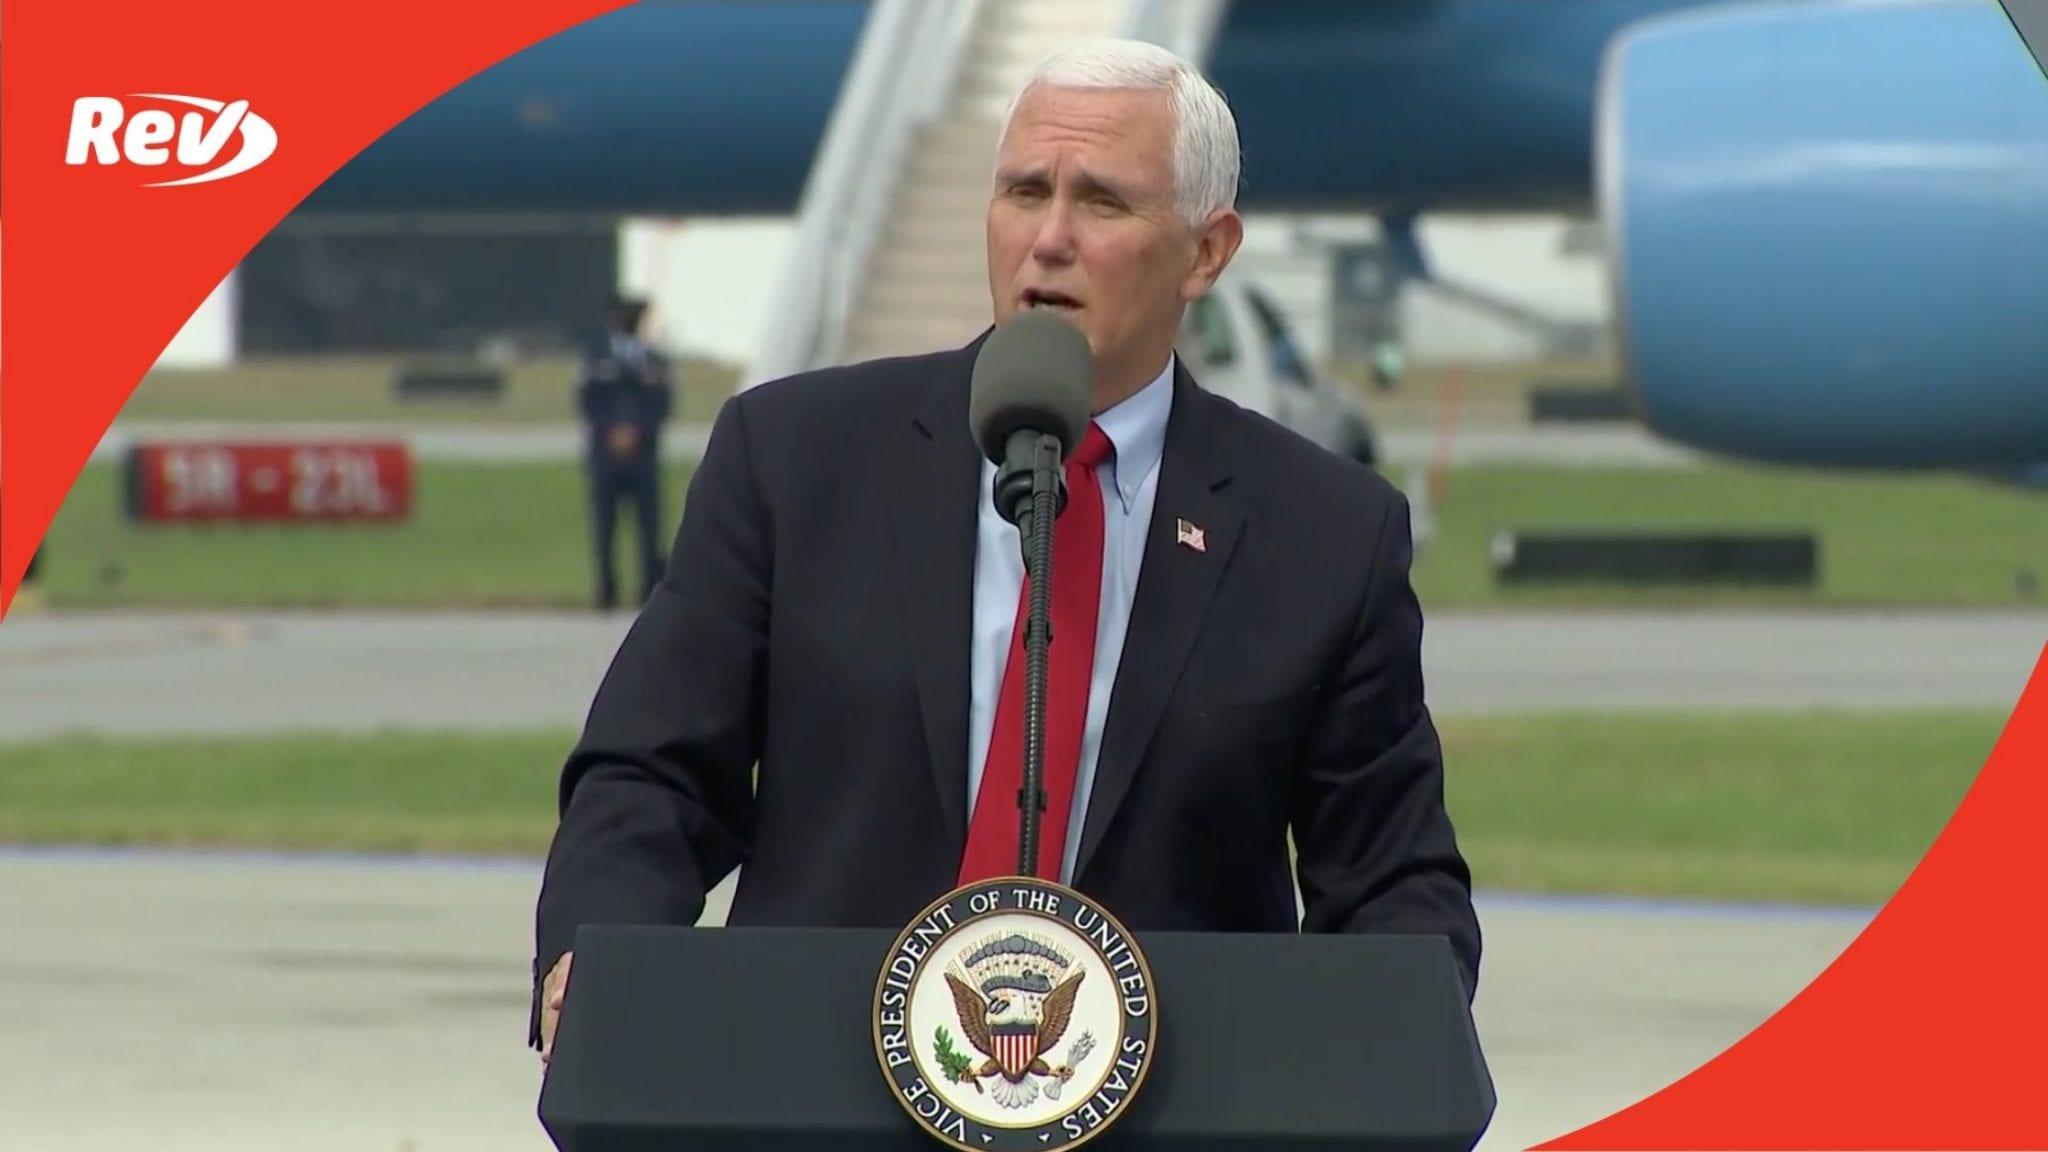 Mike Pence Campaign Speech Transcript Greensboro, NC October 27